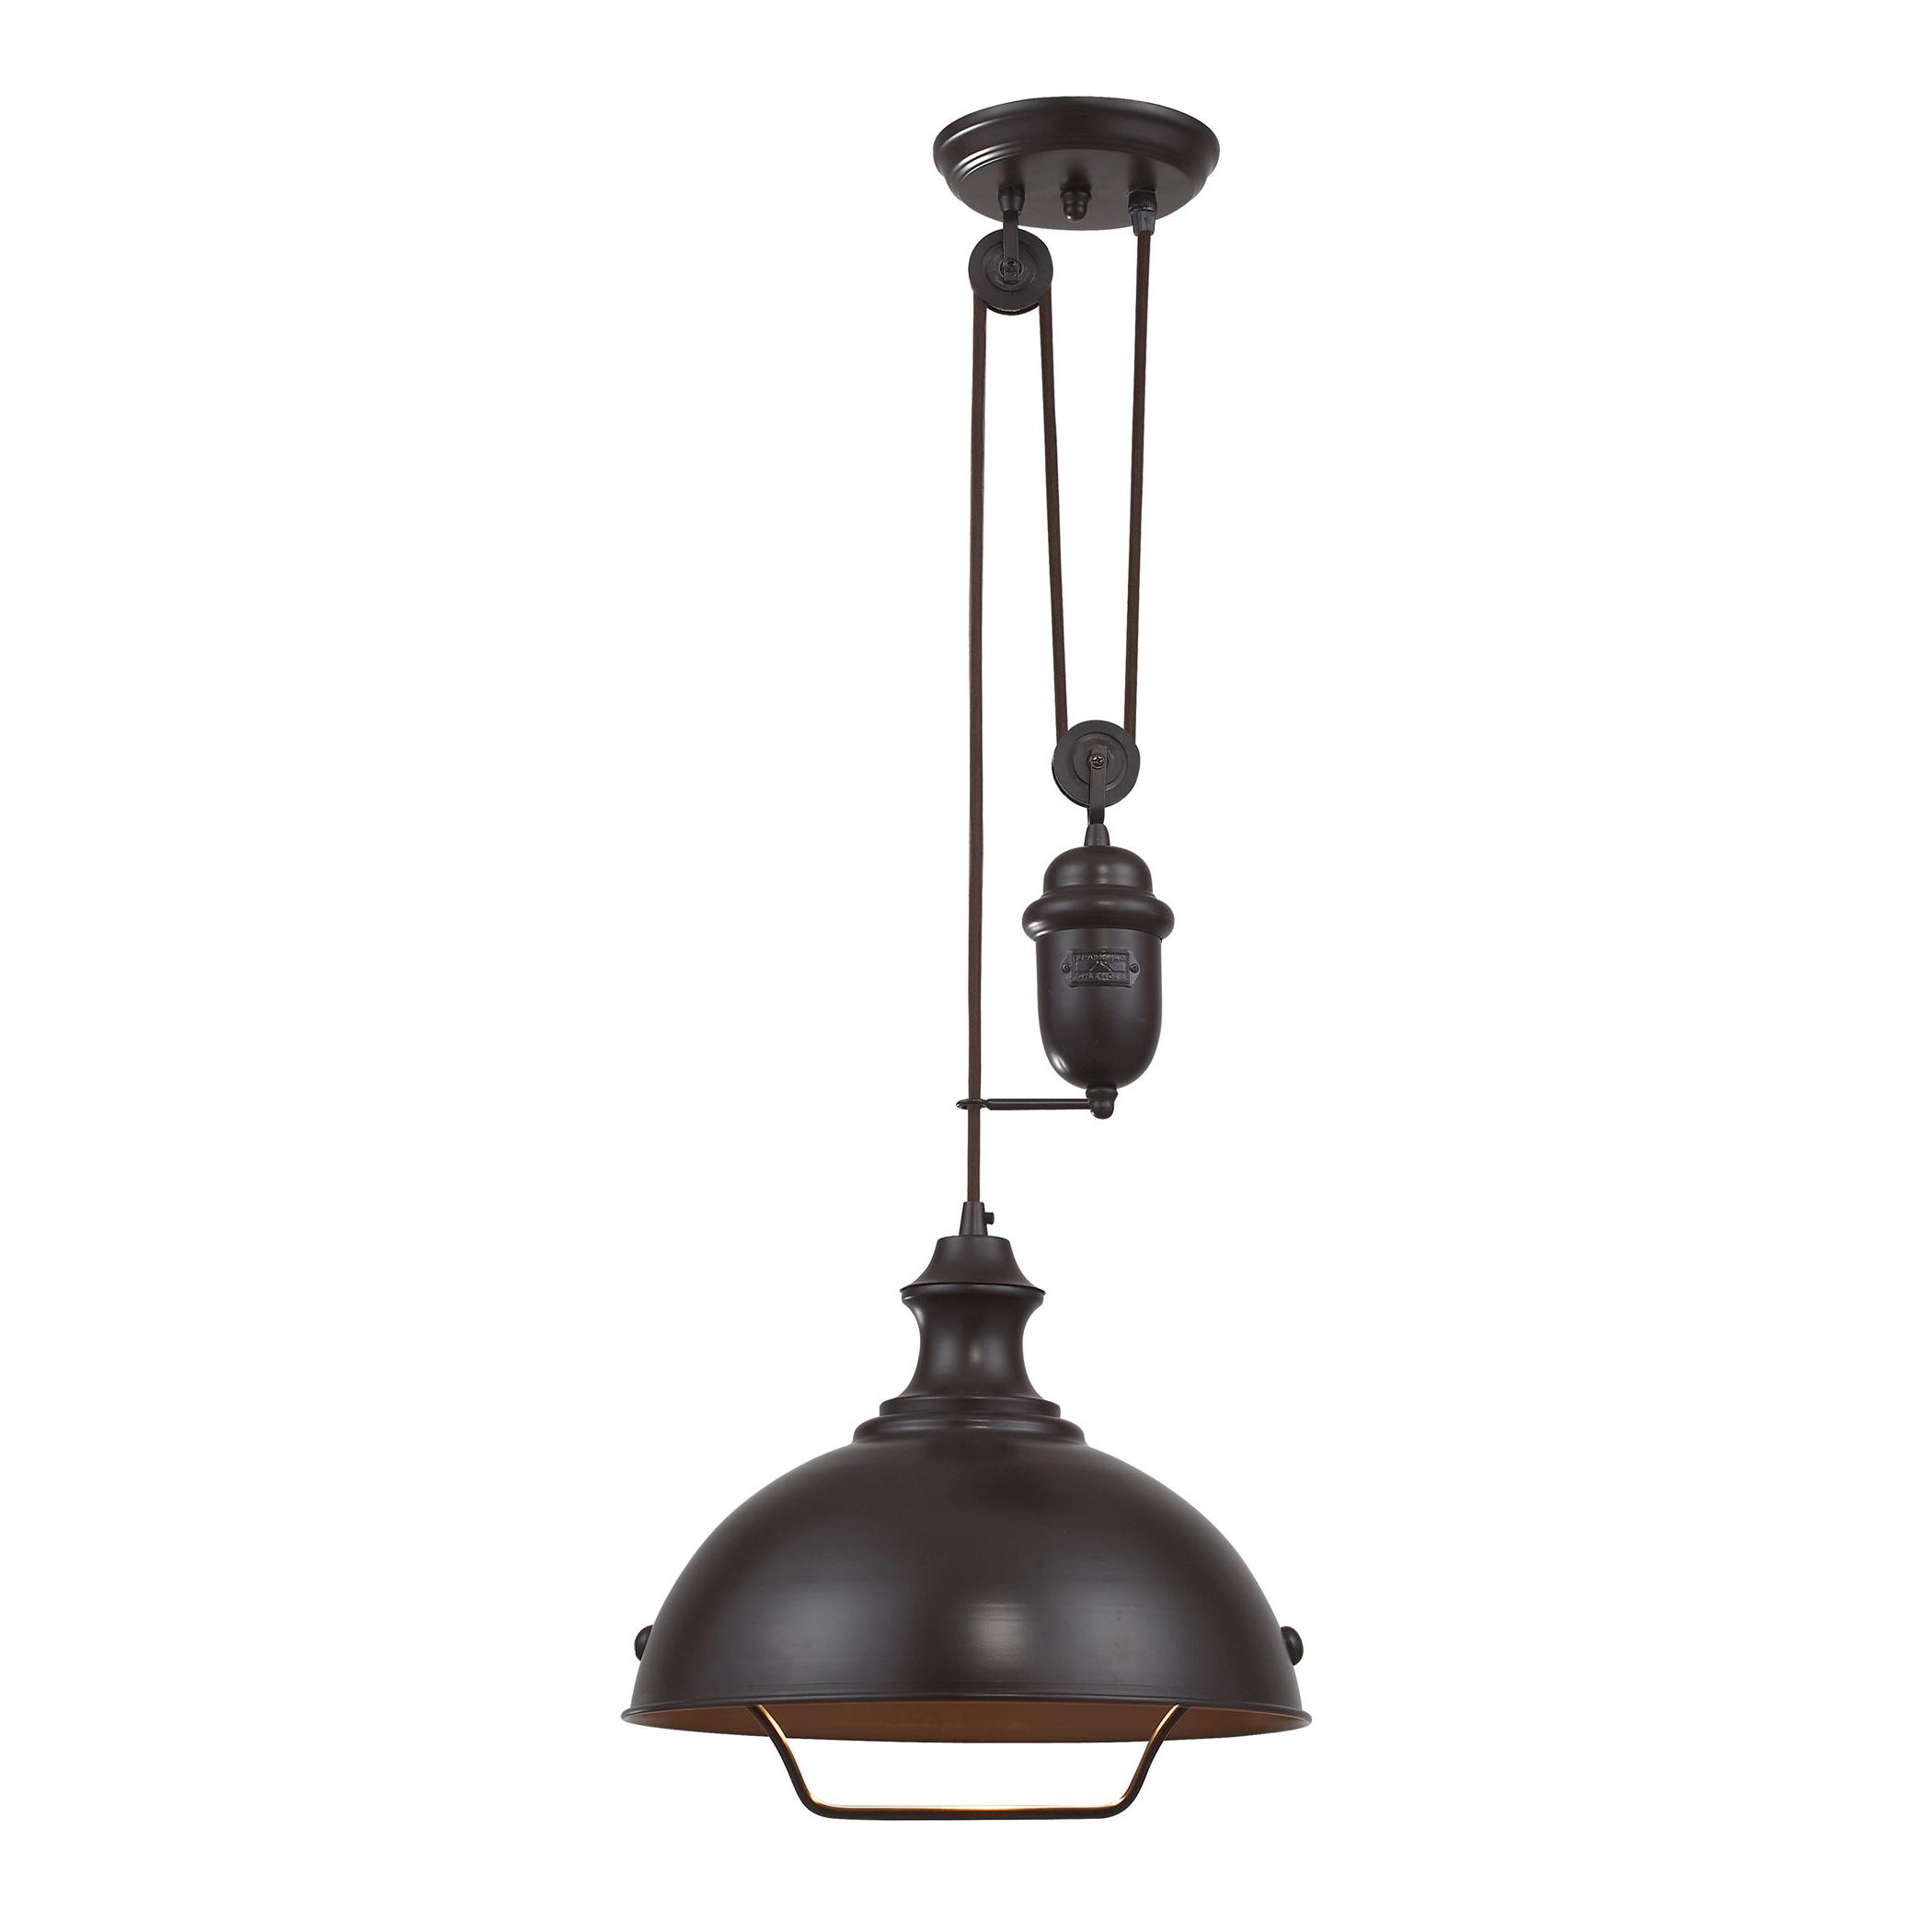 Fashionable Legrand 1 Light Single Dome Pendant Intended For 1 Light Single Dome Pendants (View 8 of 25)